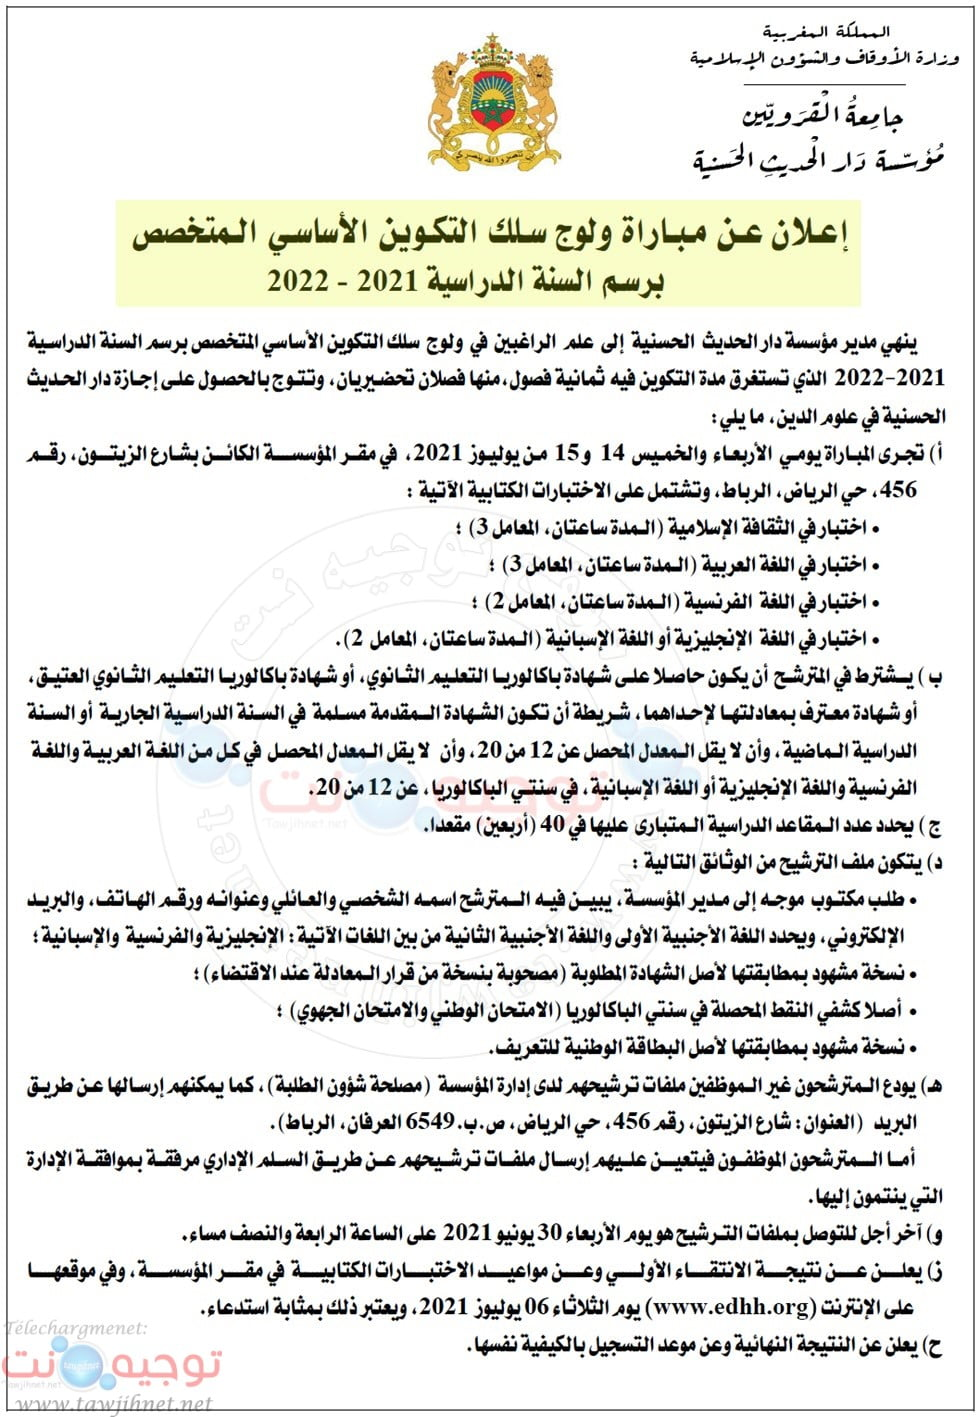 Concours Dar El Hadith El Hassania Bac Rabat مؤسسة دار الحديث الحسنية 2021 2022